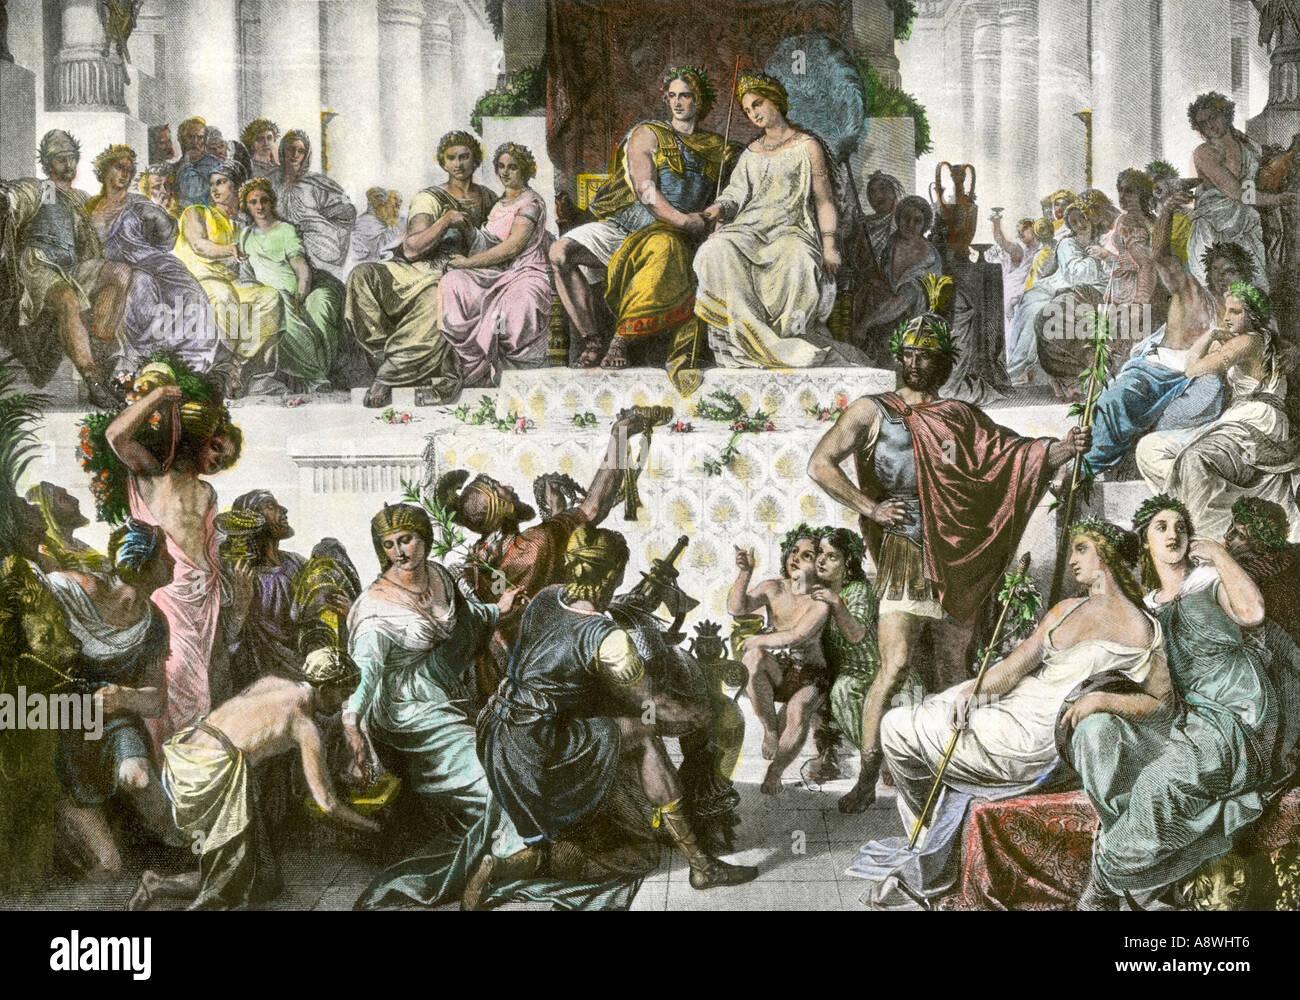 Mariage d'Alexandre le Grand et Statira Photo Stock